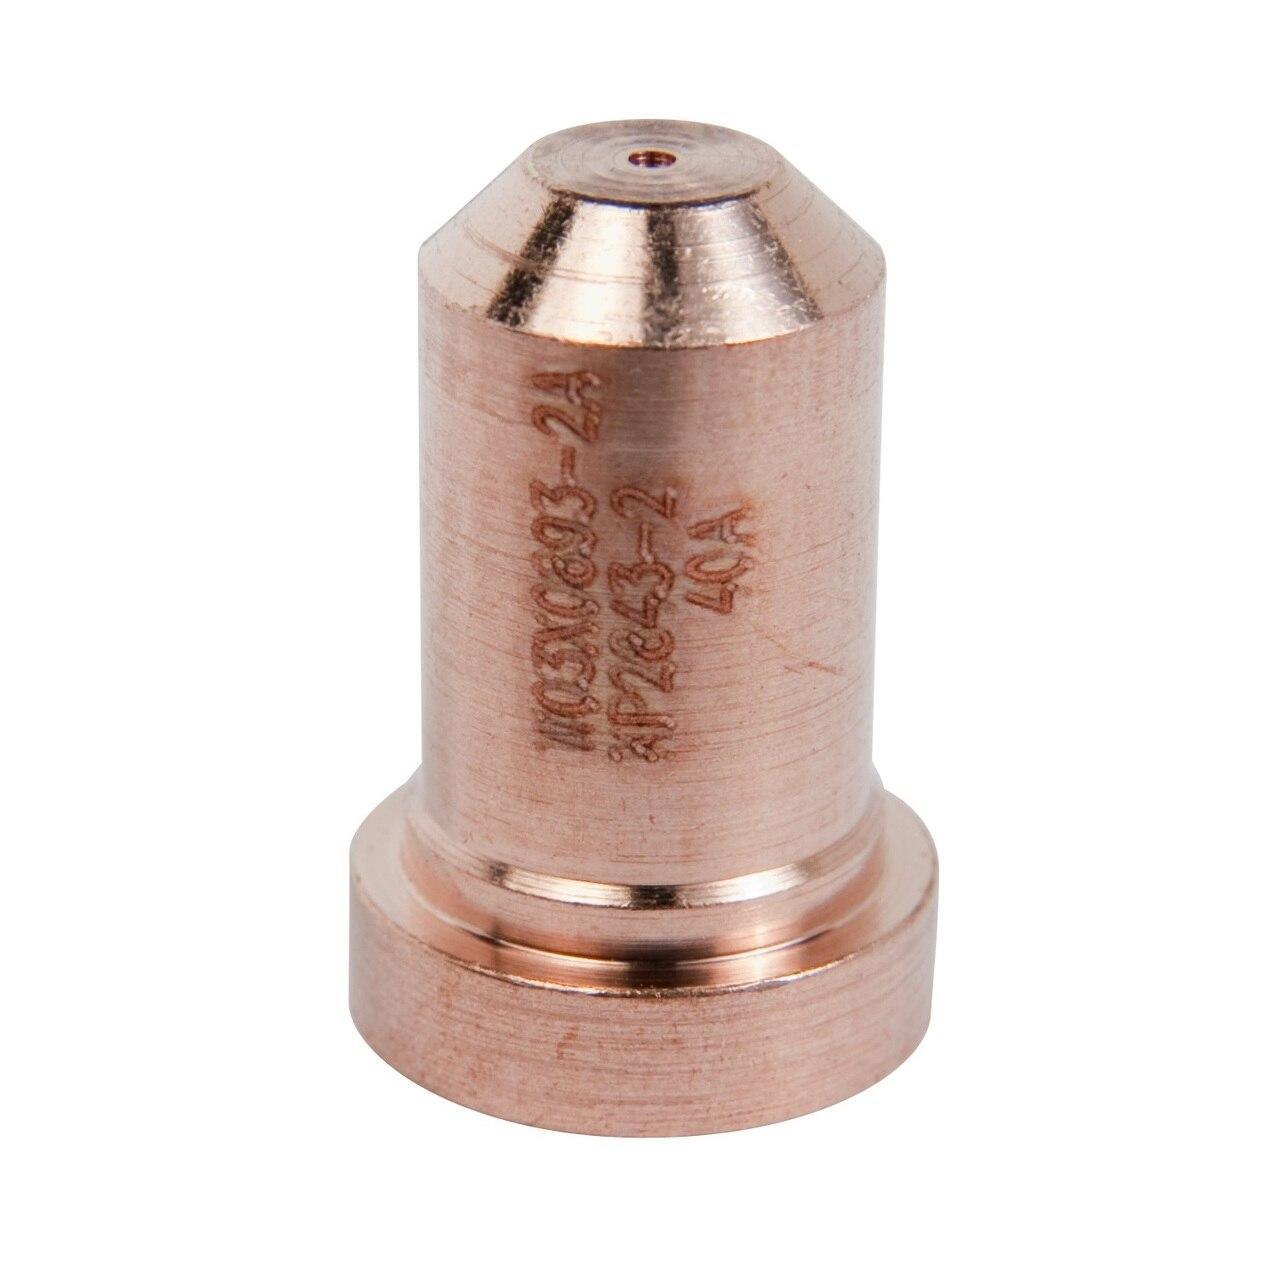 Lincoln Tomahawk 625 Plasma Nozzles 5 Pack KP2843-2